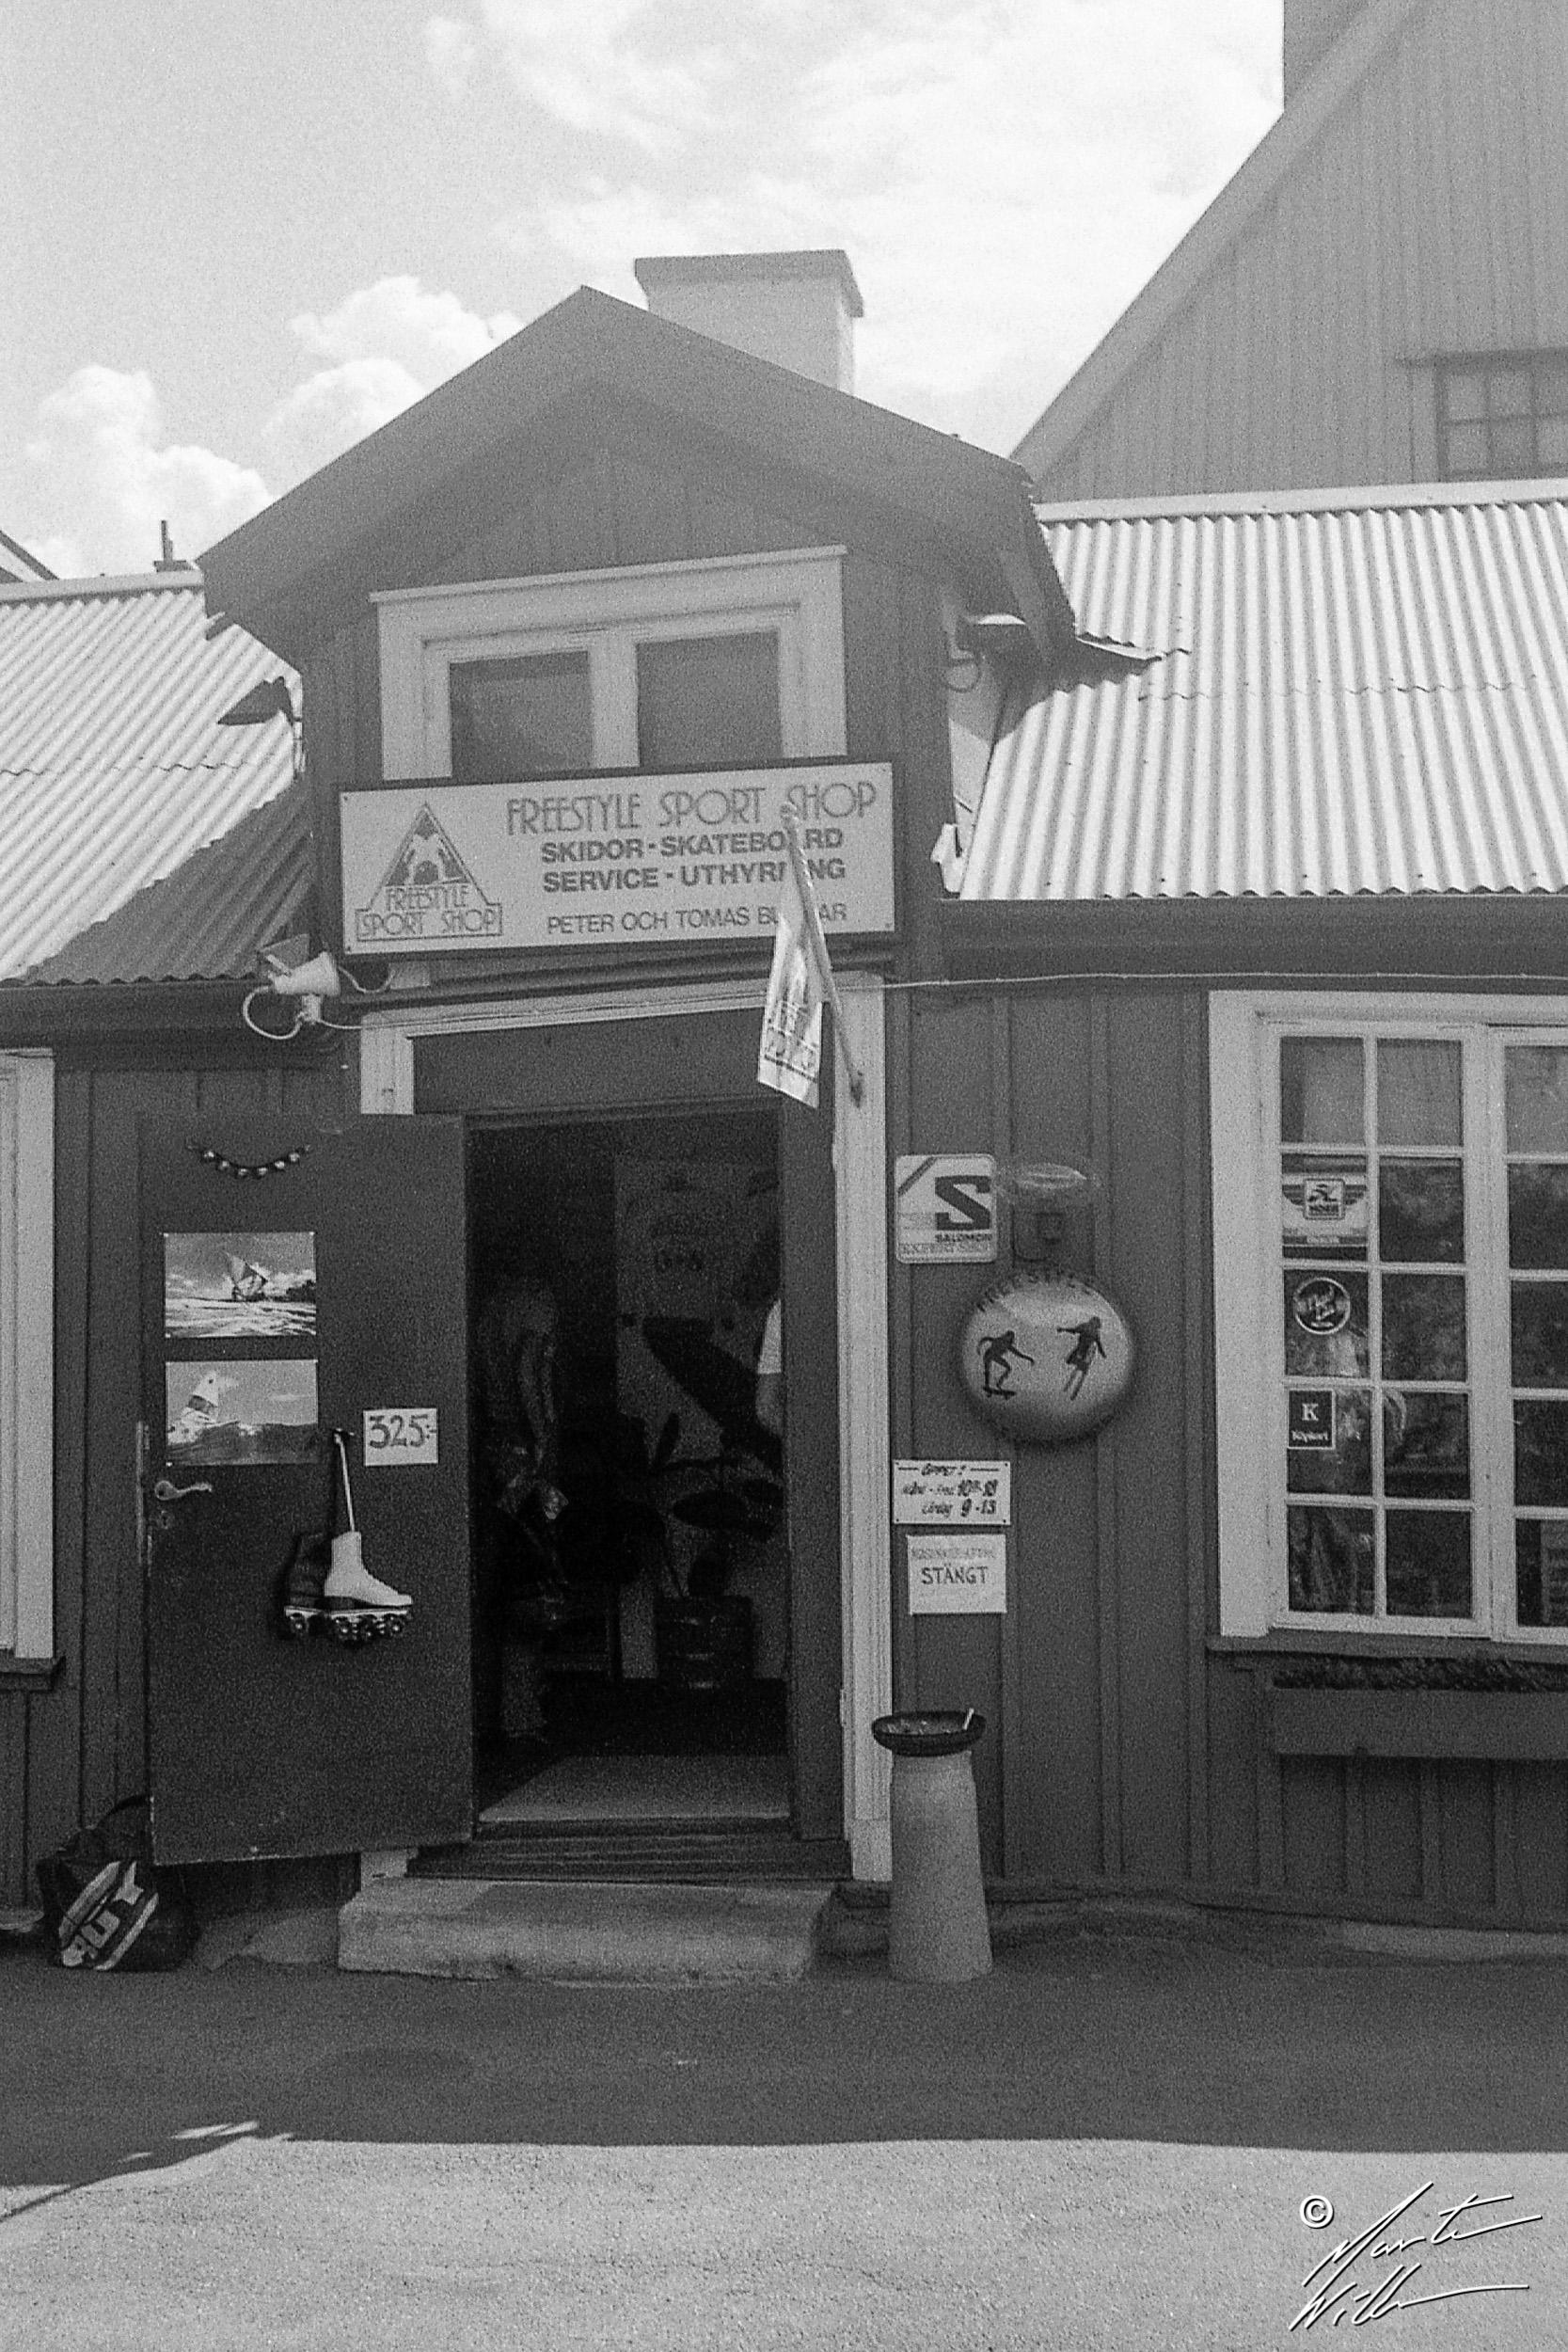 Freestyle Sport Shop,  Jönköping, 1978